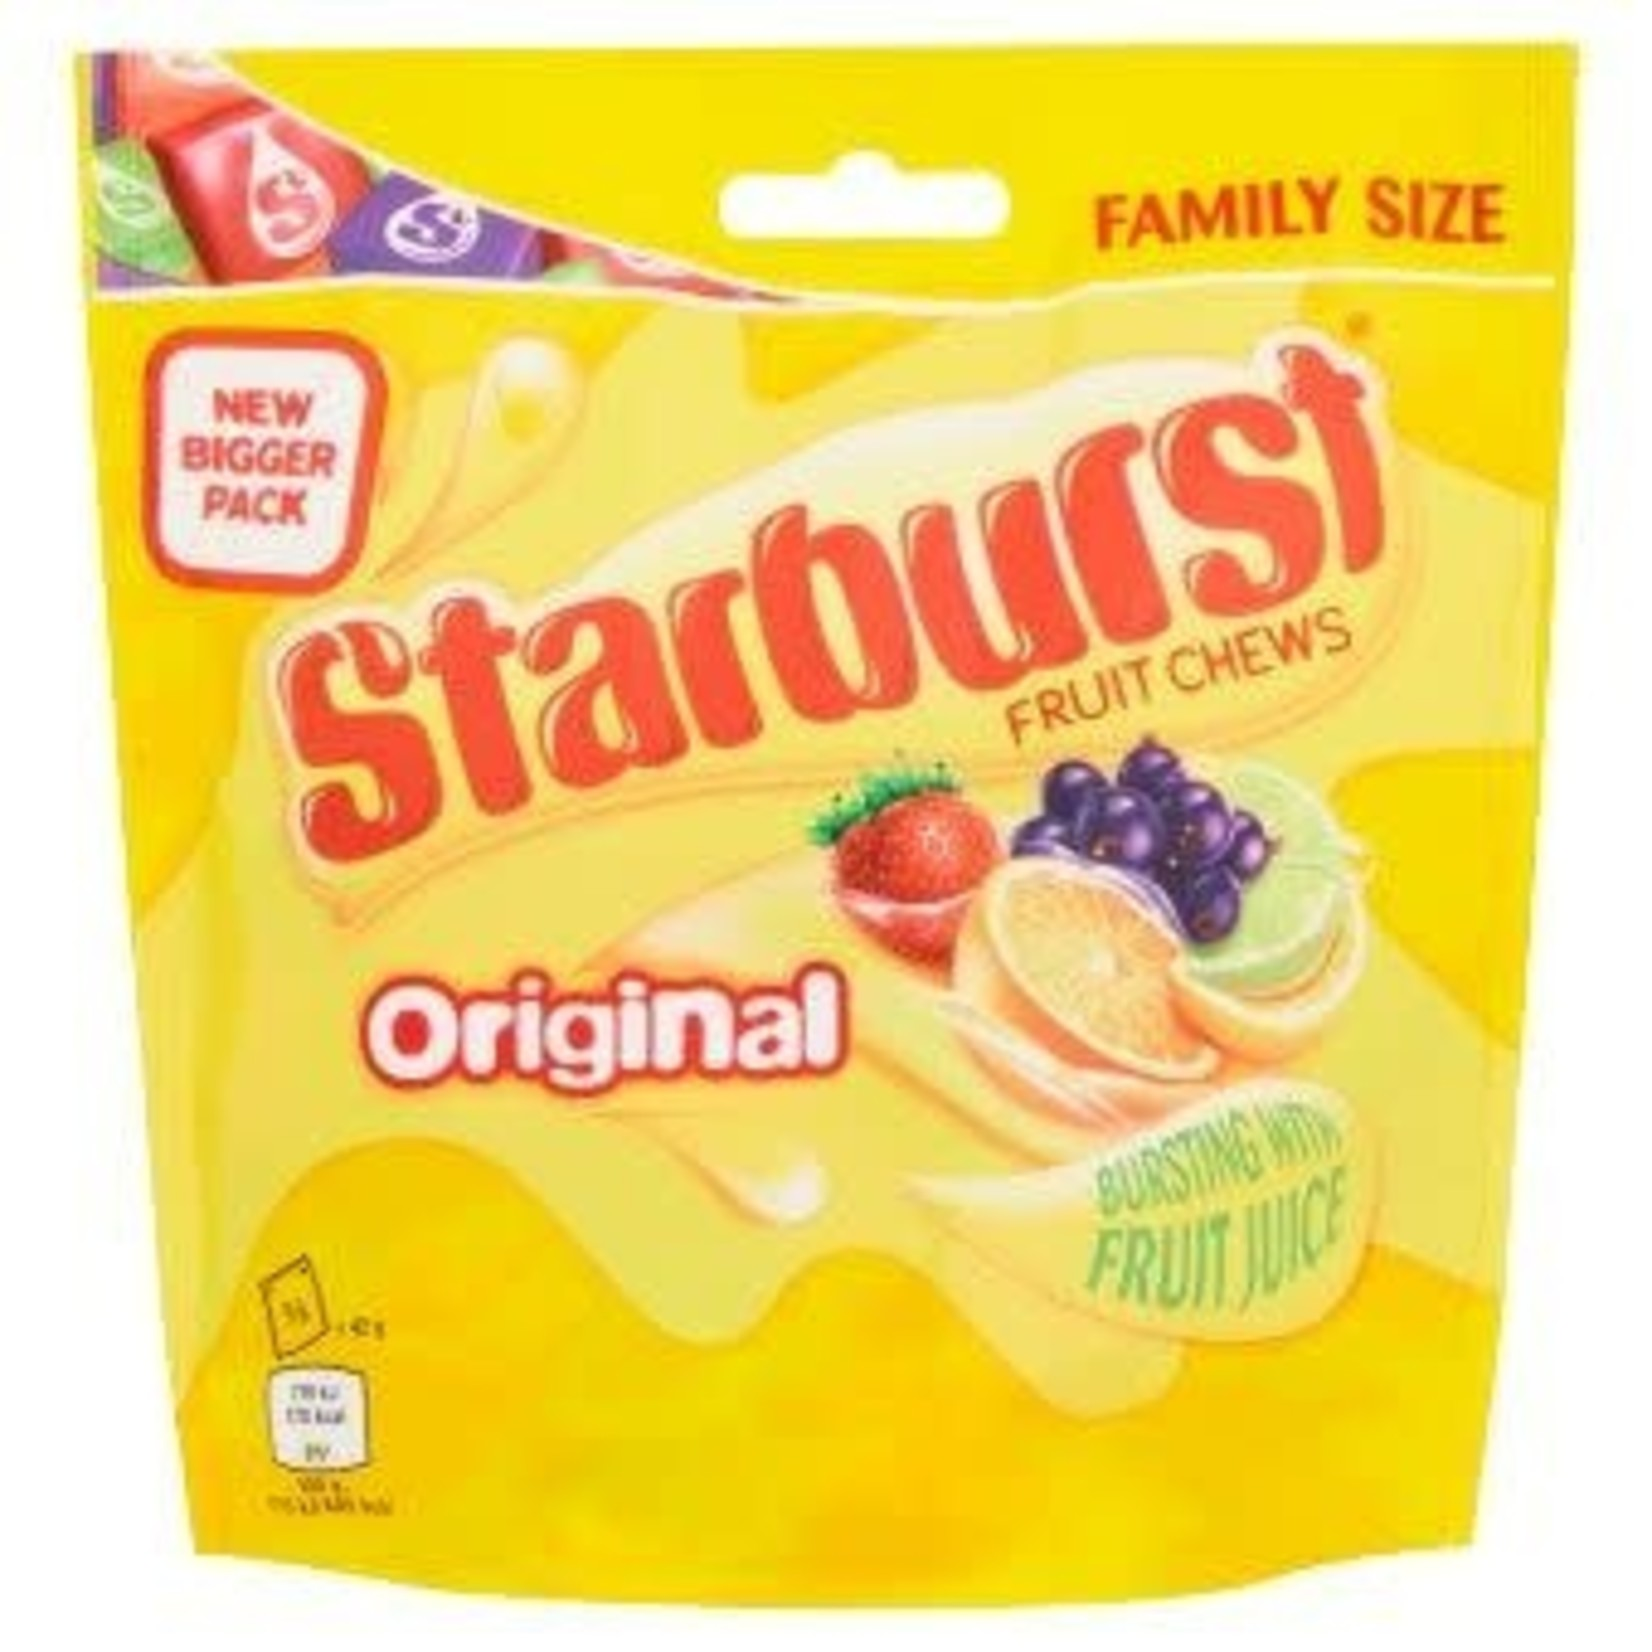 Starburst Original Family Size, 210g